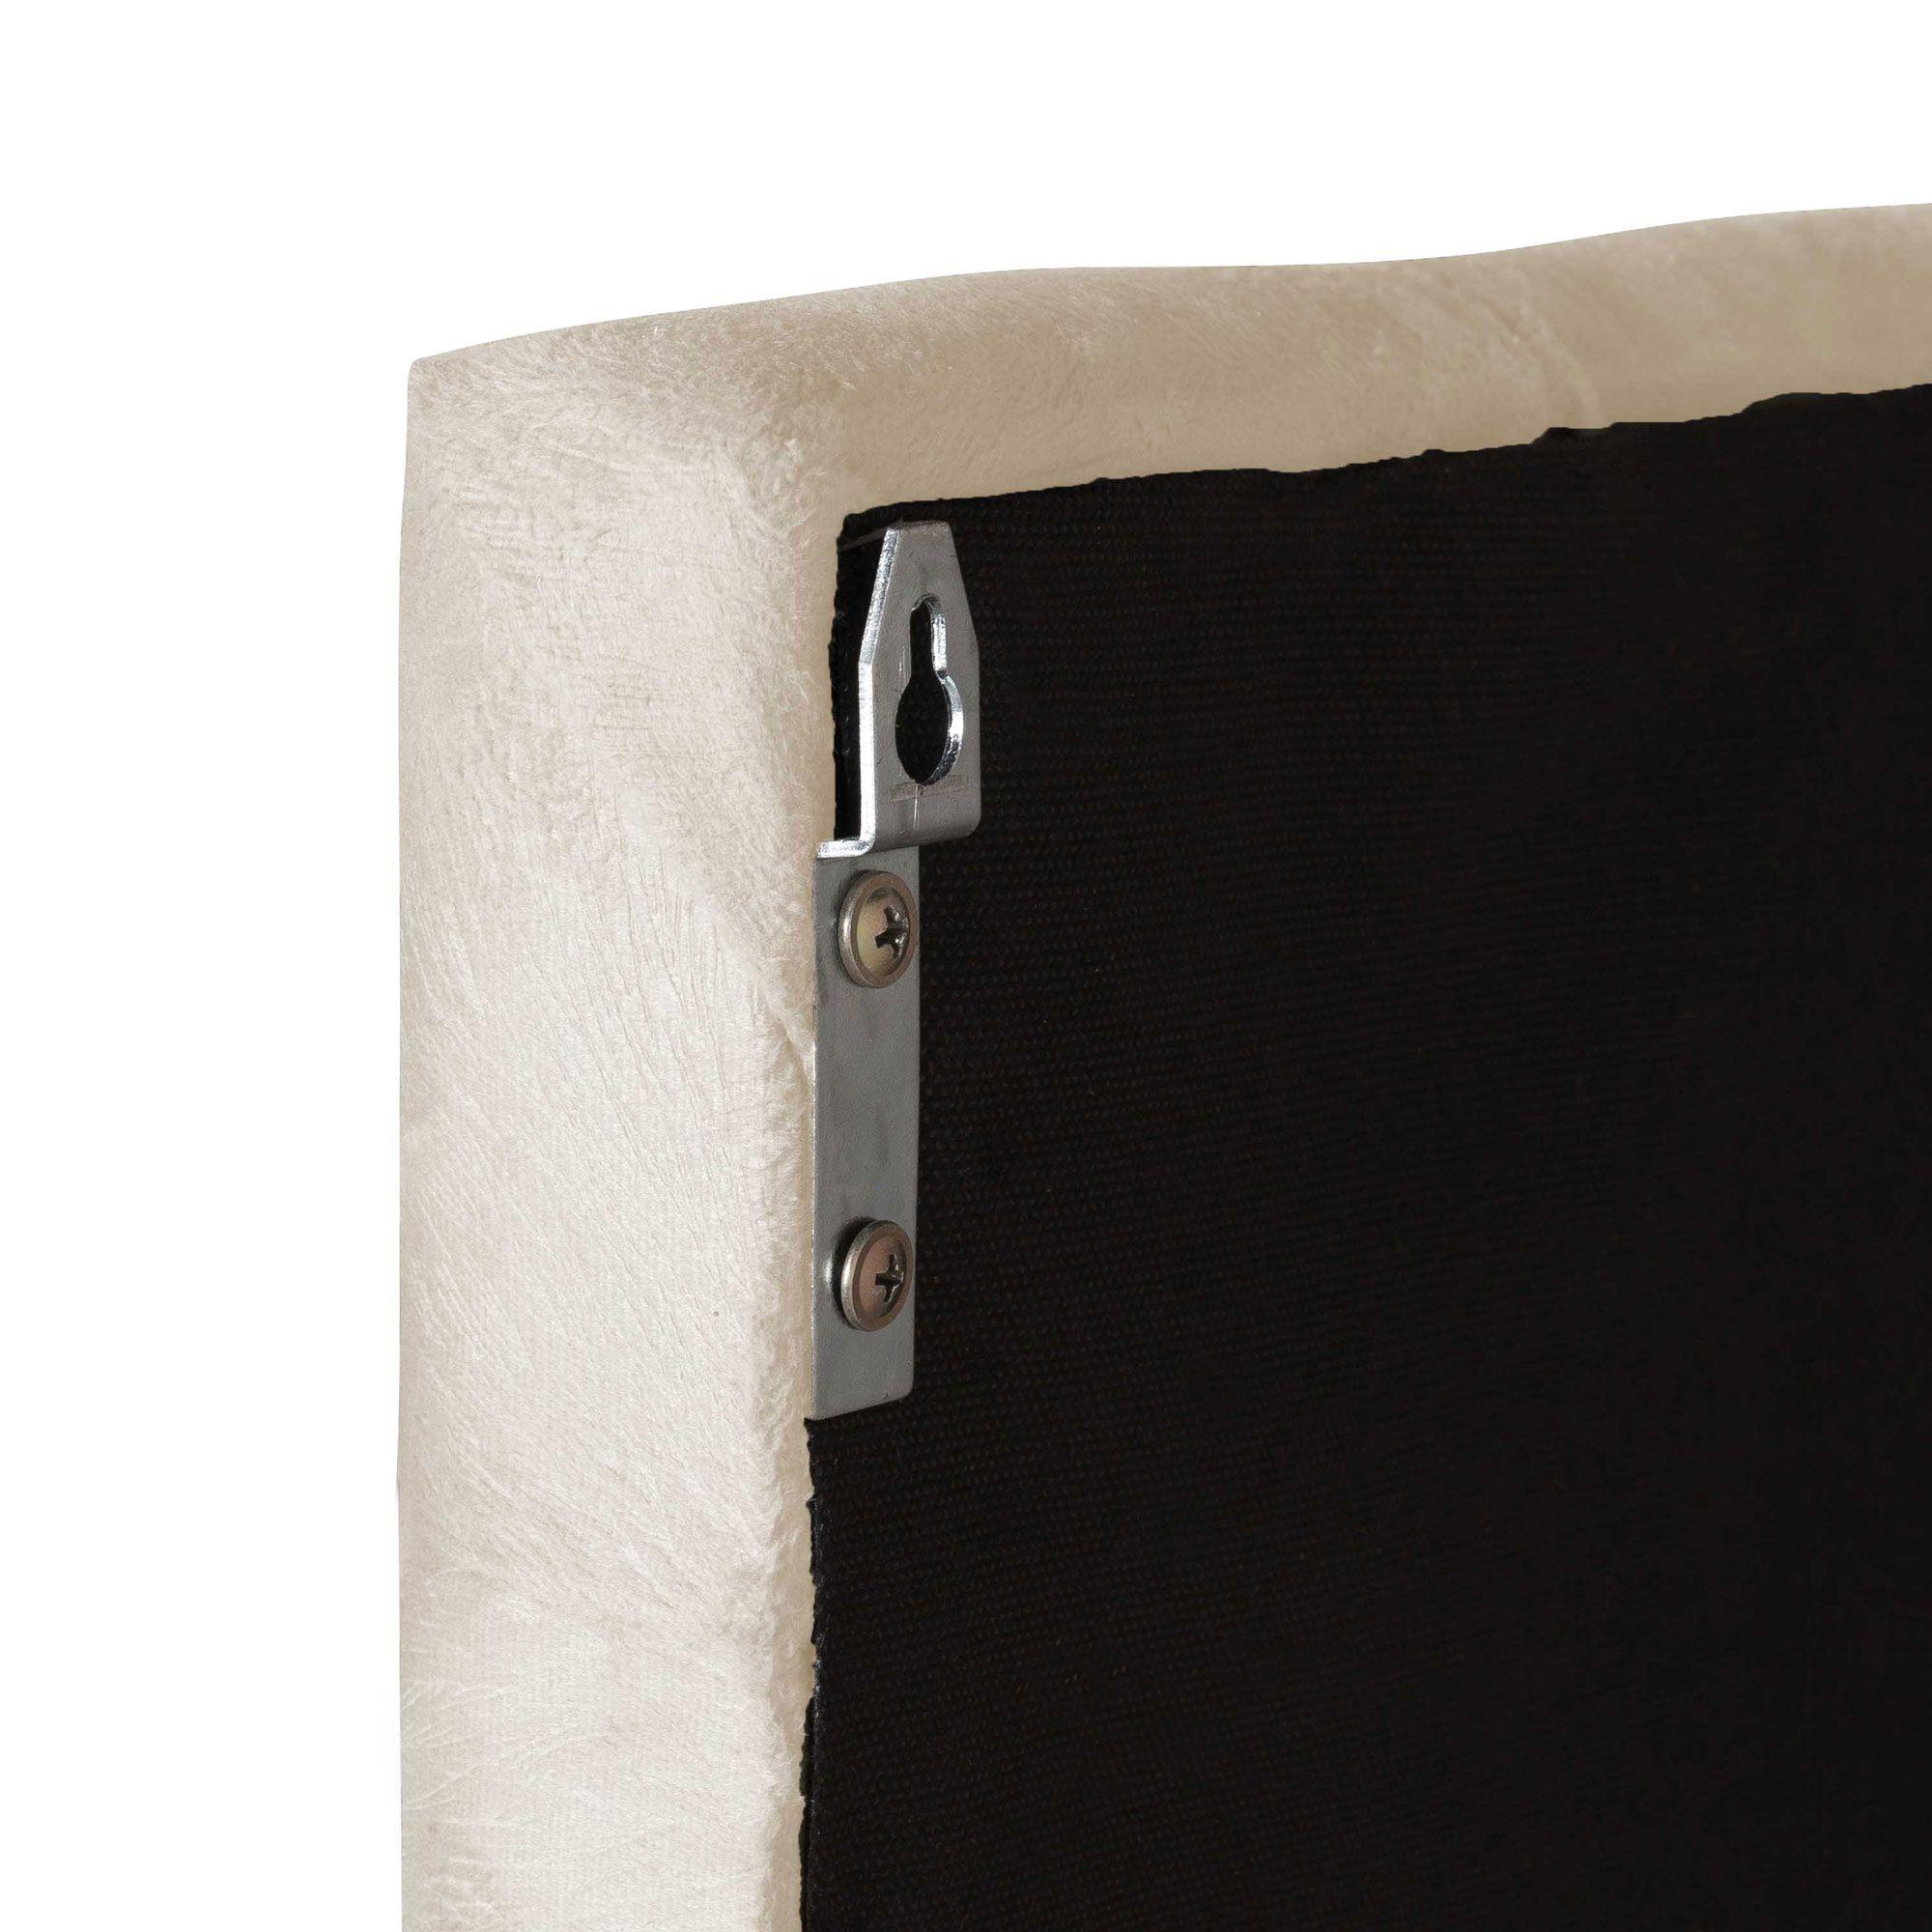 Cabeceira Cama Box Intense Casal 1.4 Várias Cores